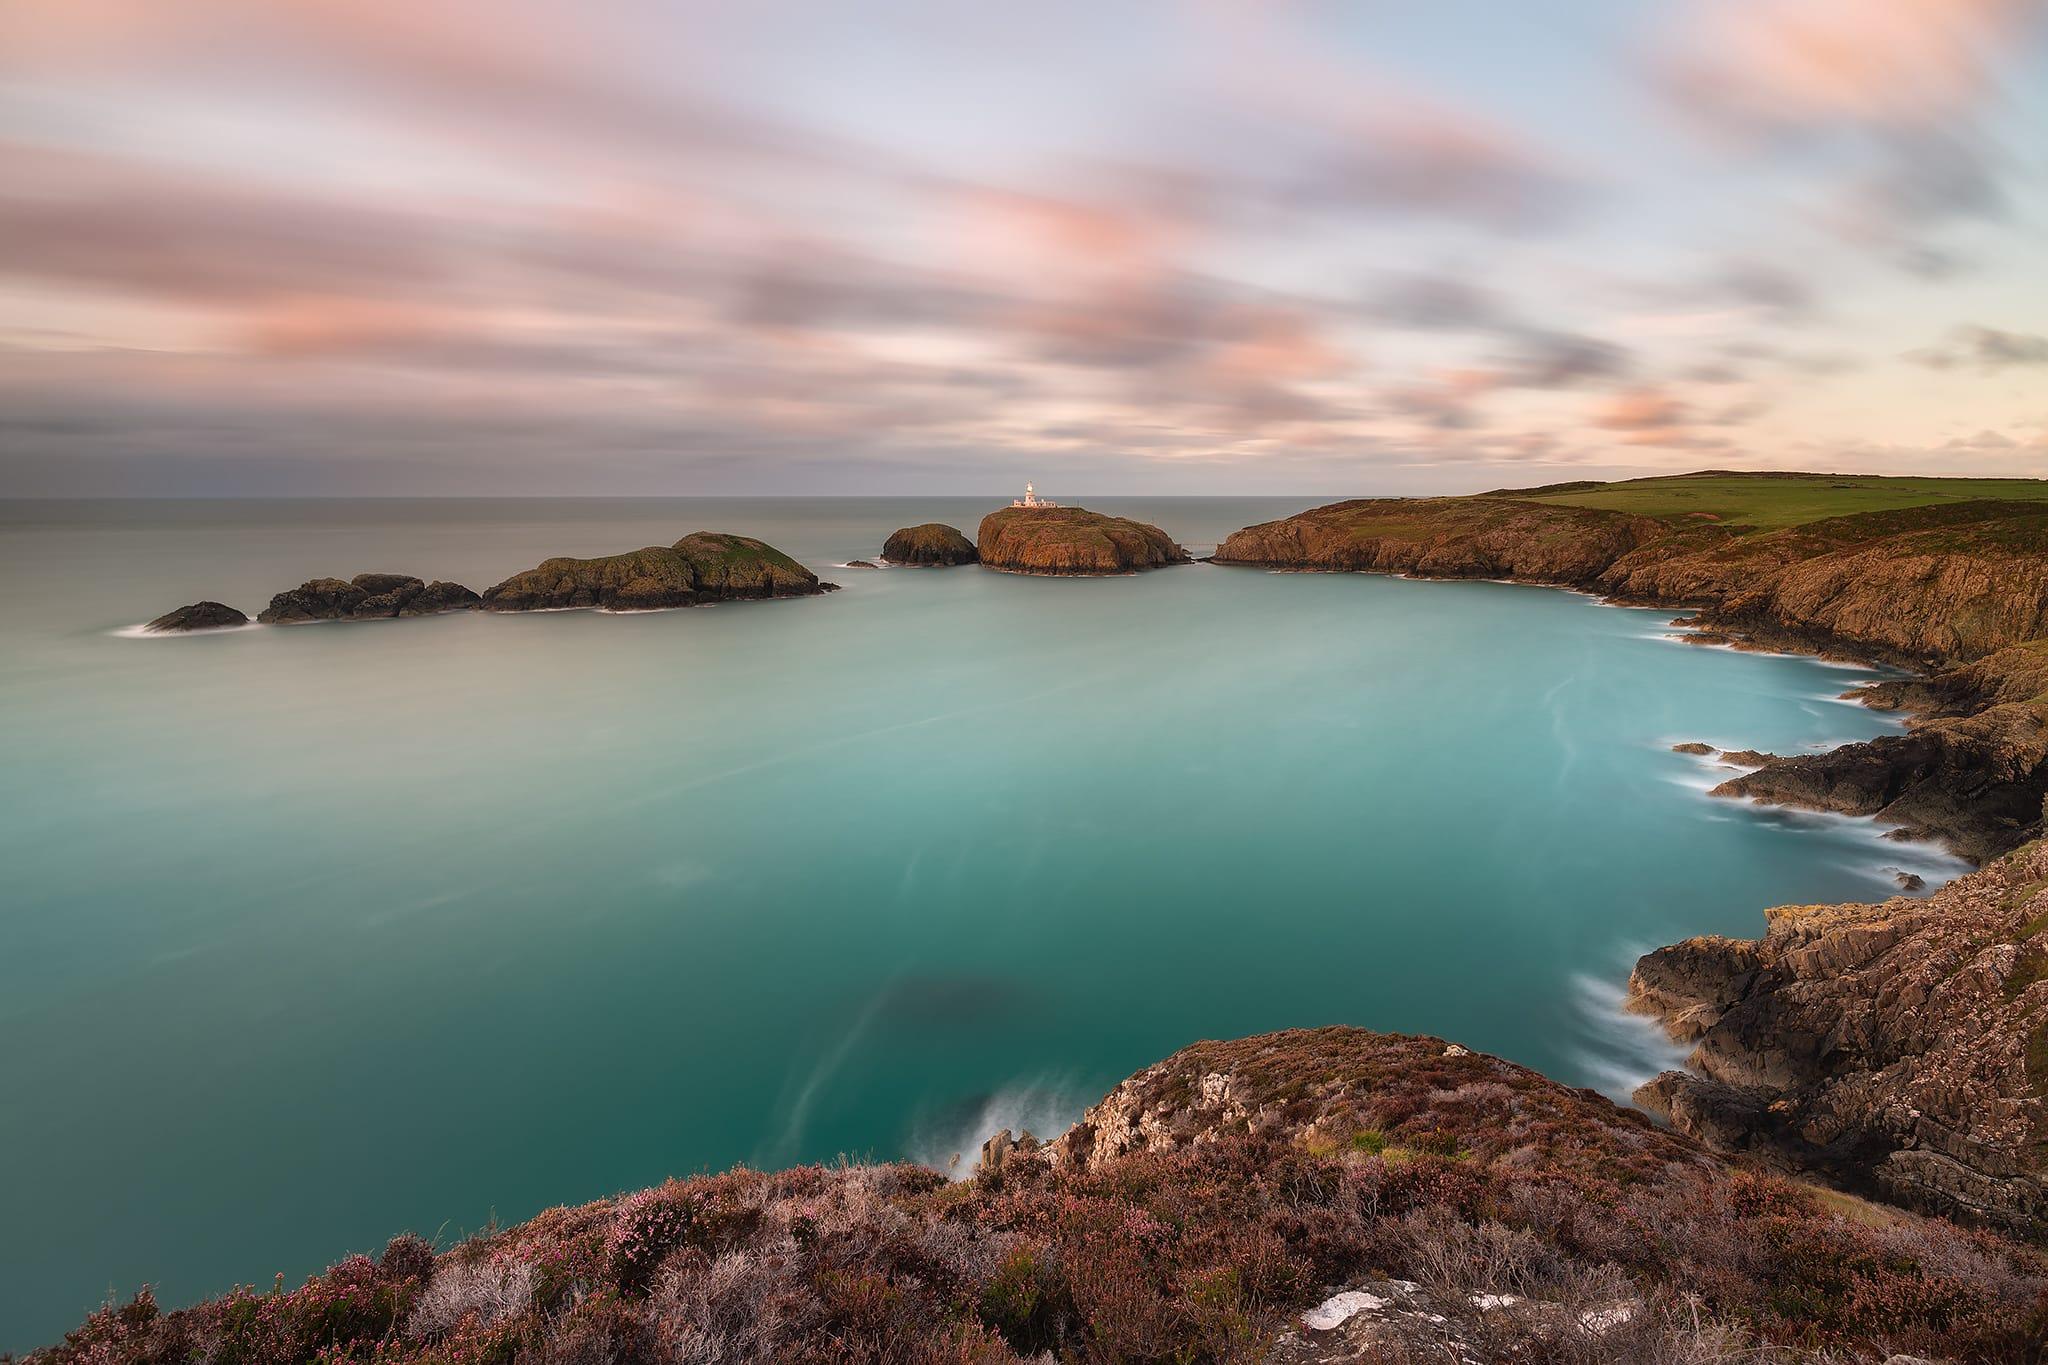 Francesco Gola Seascape Photography Long Exposure UK Wales Strumble Head Lighthouse